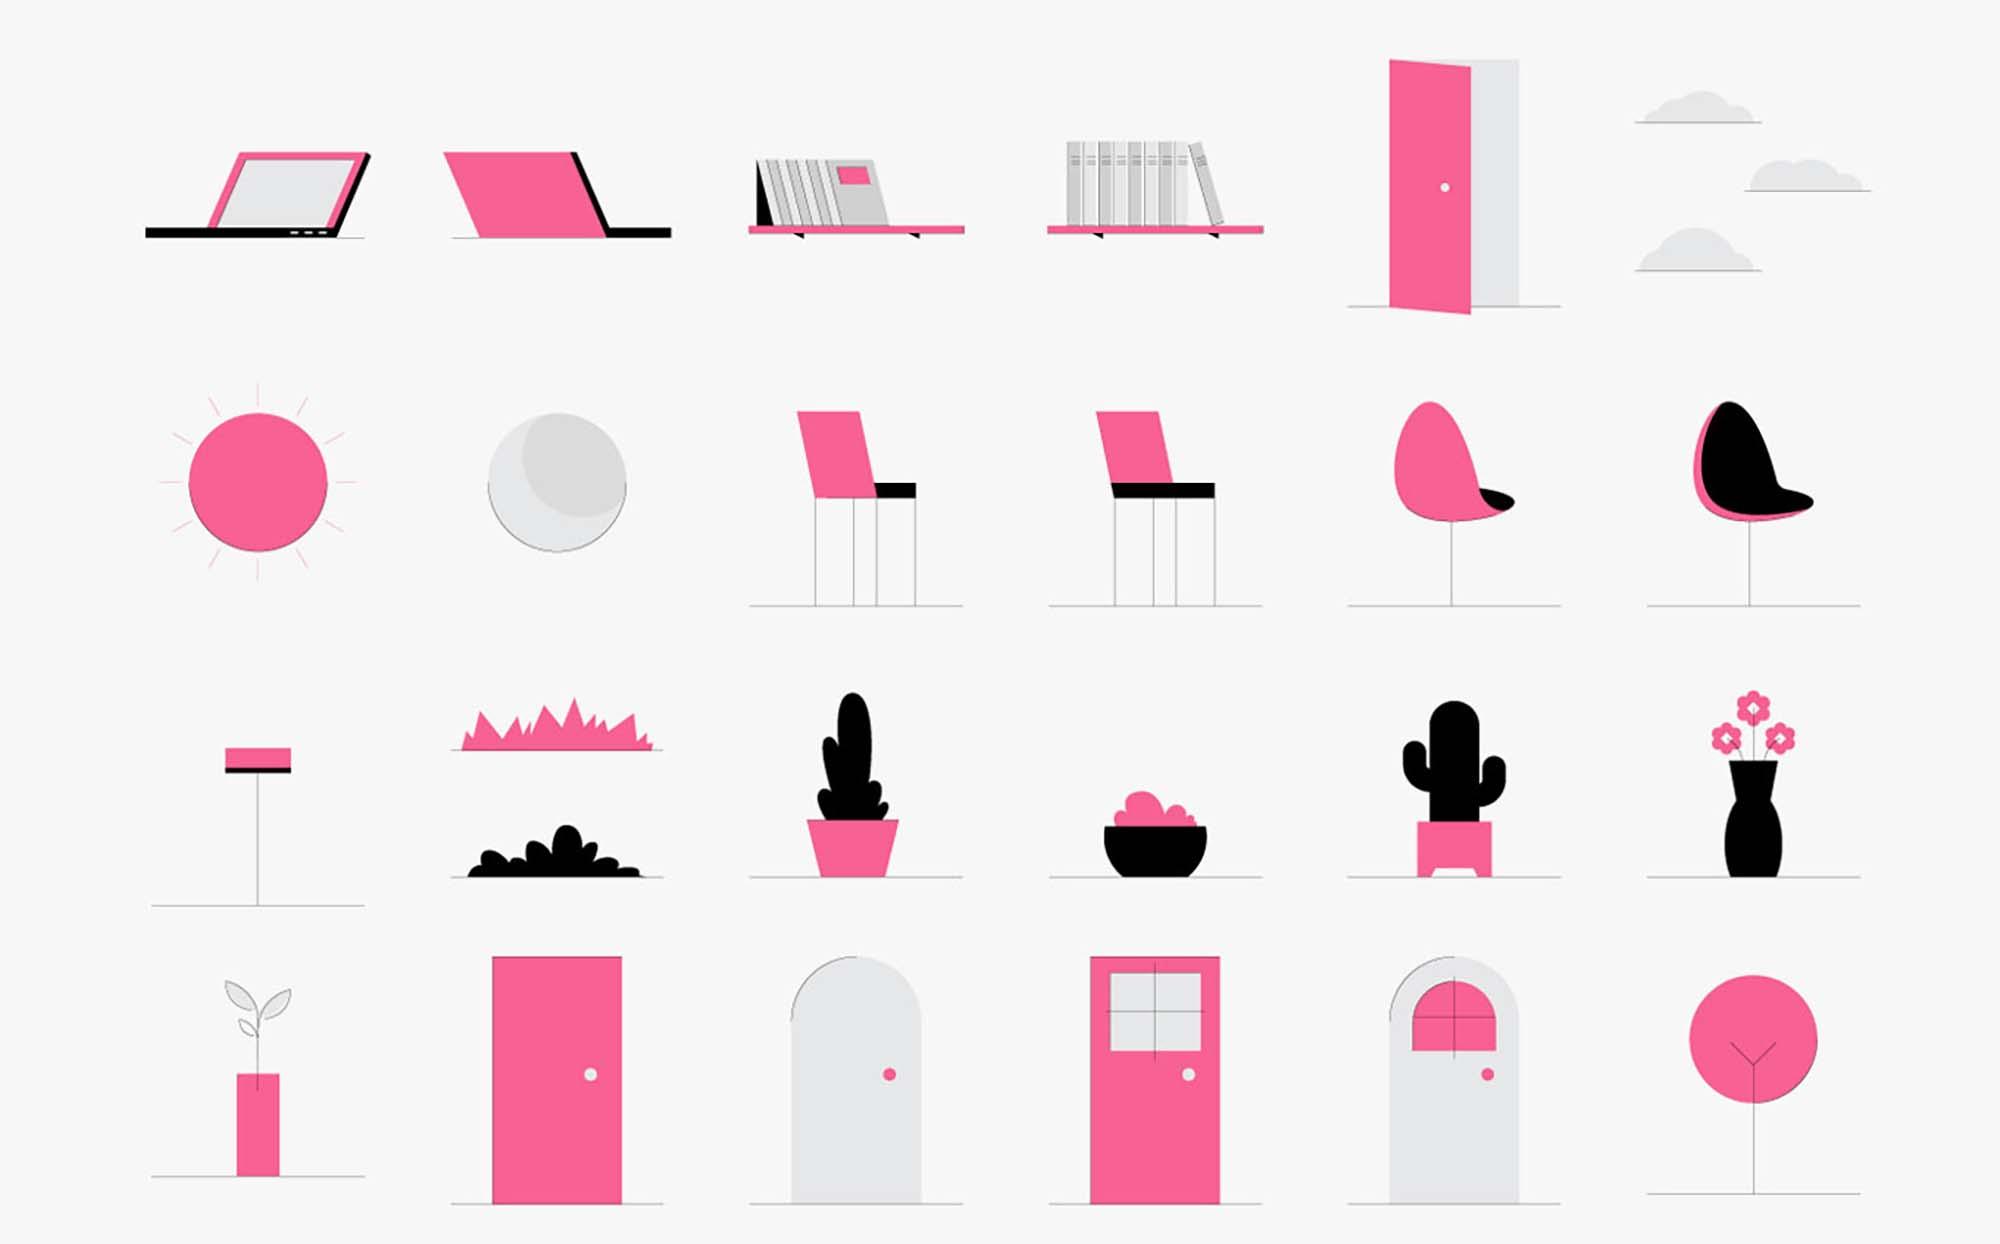 Minimalistic Characters Illustrations 4